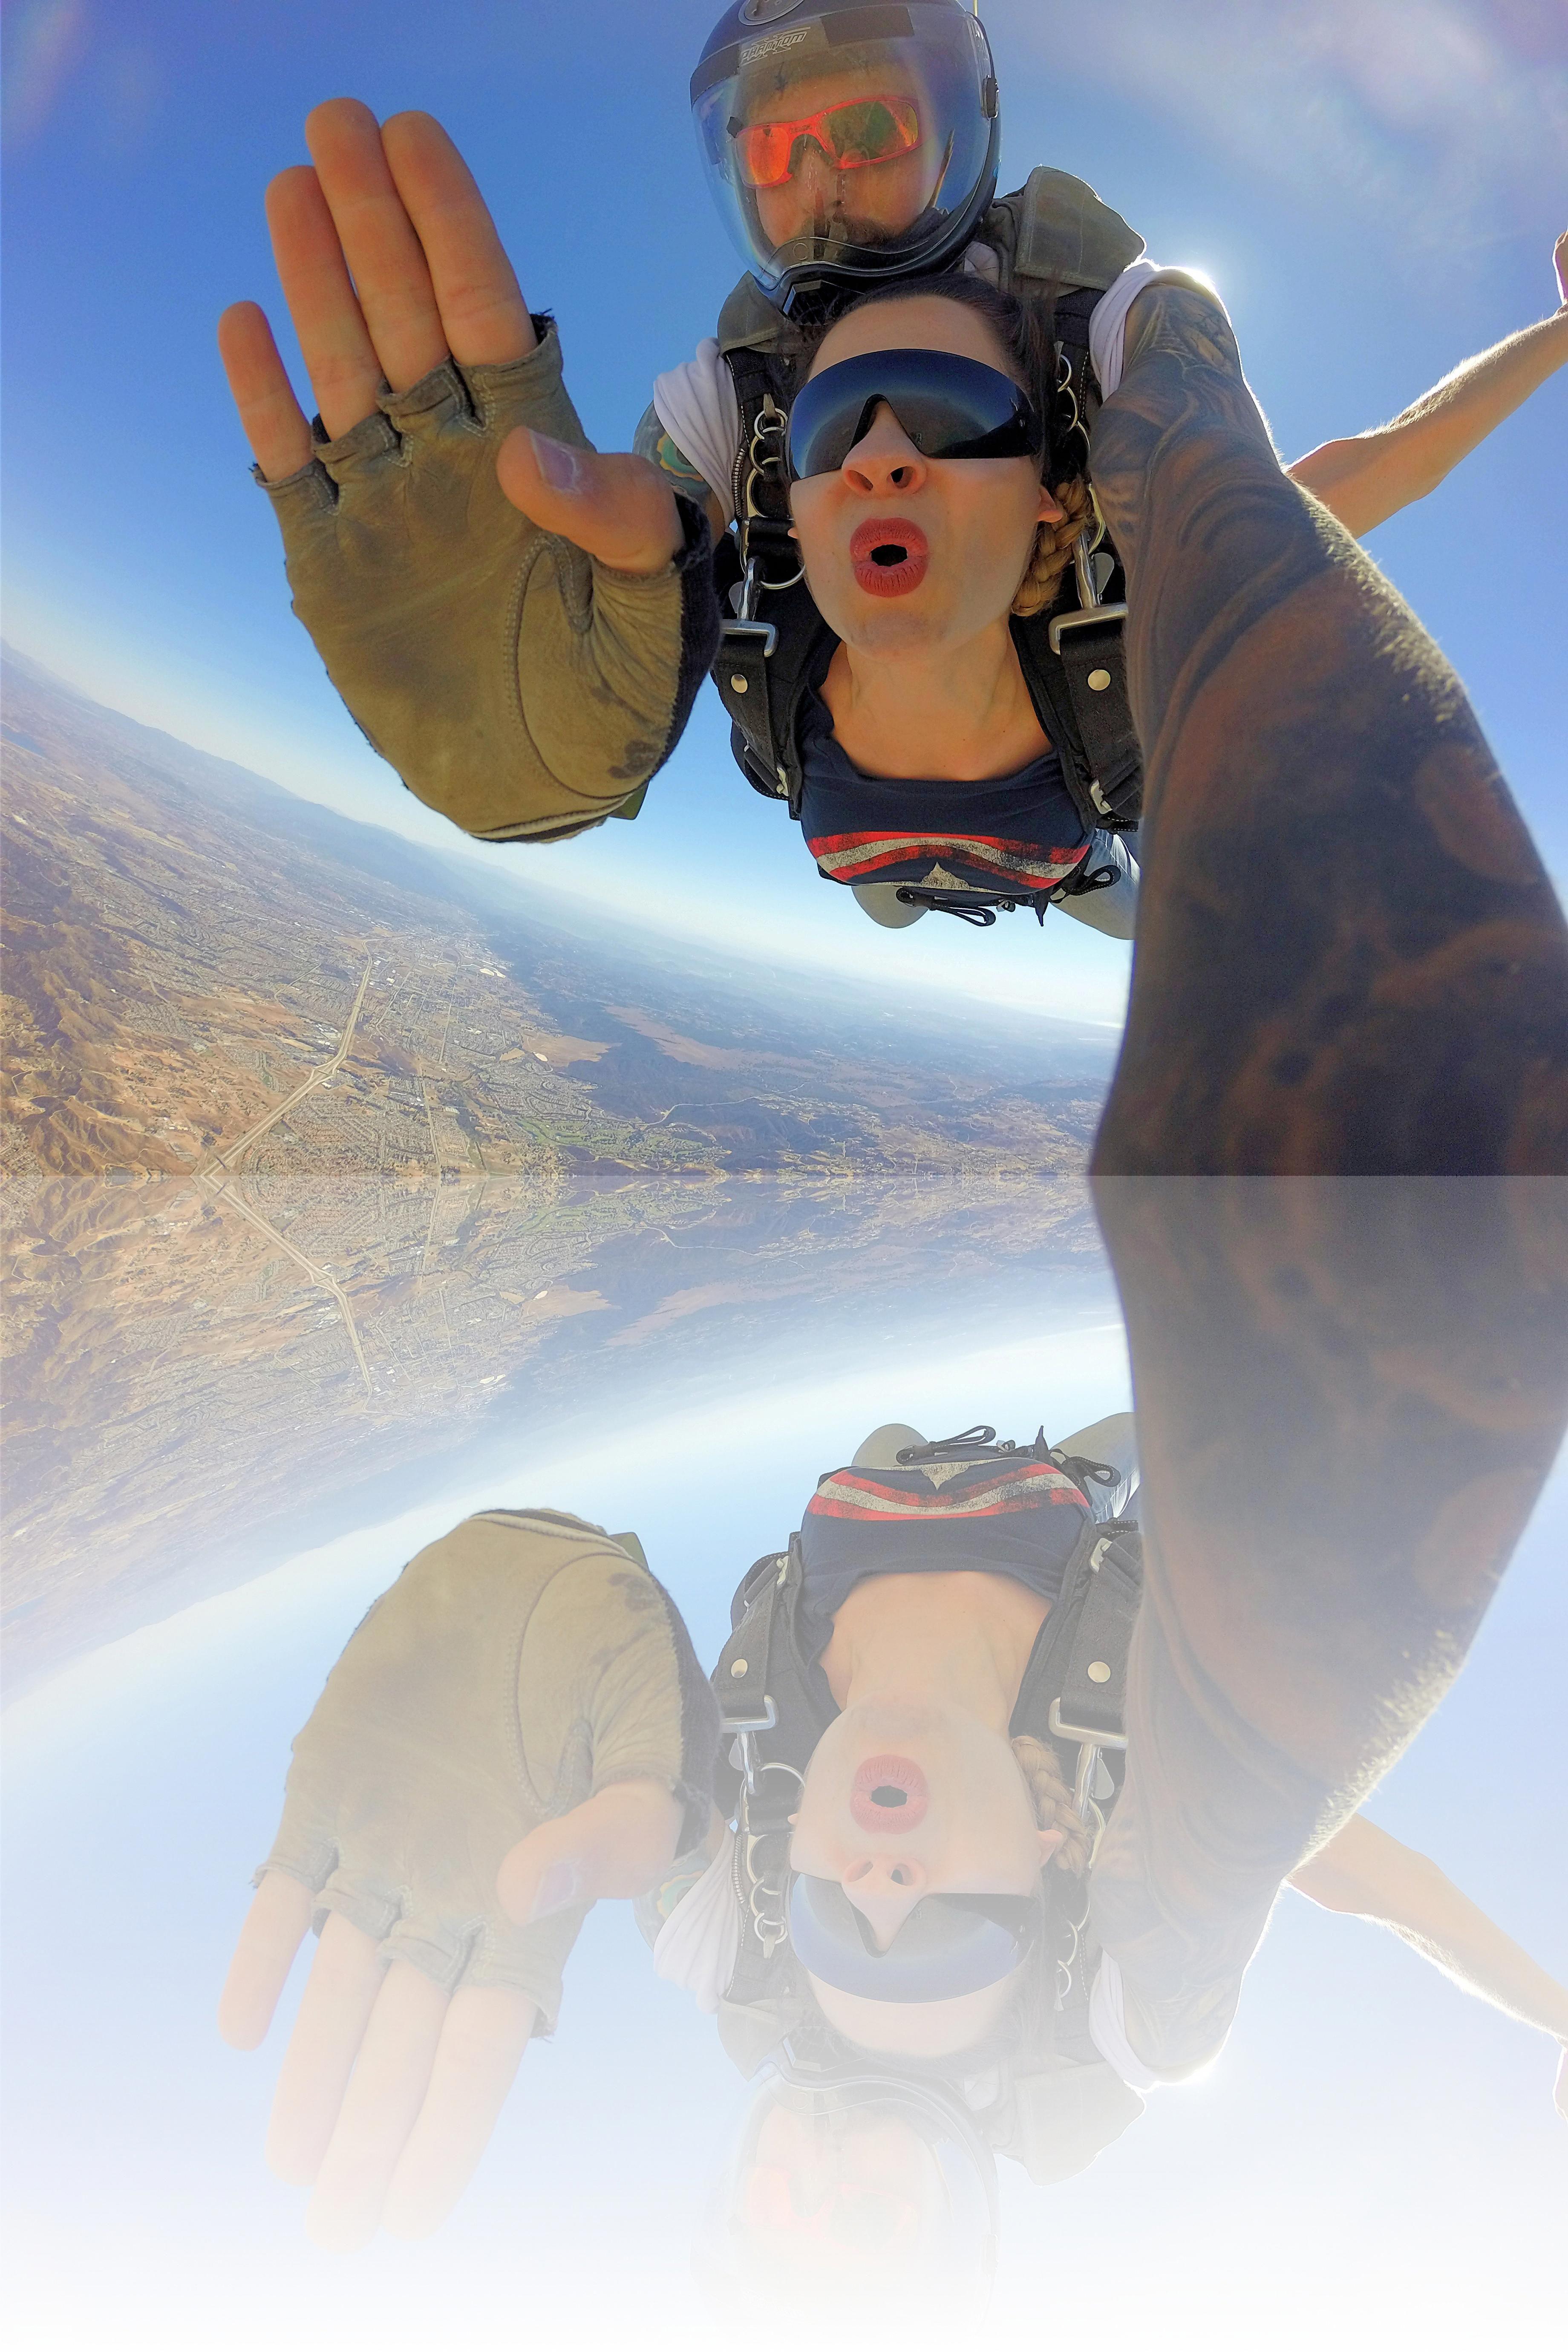 The Feeling Of Tandem Skydiving Skydiving Diving Sky